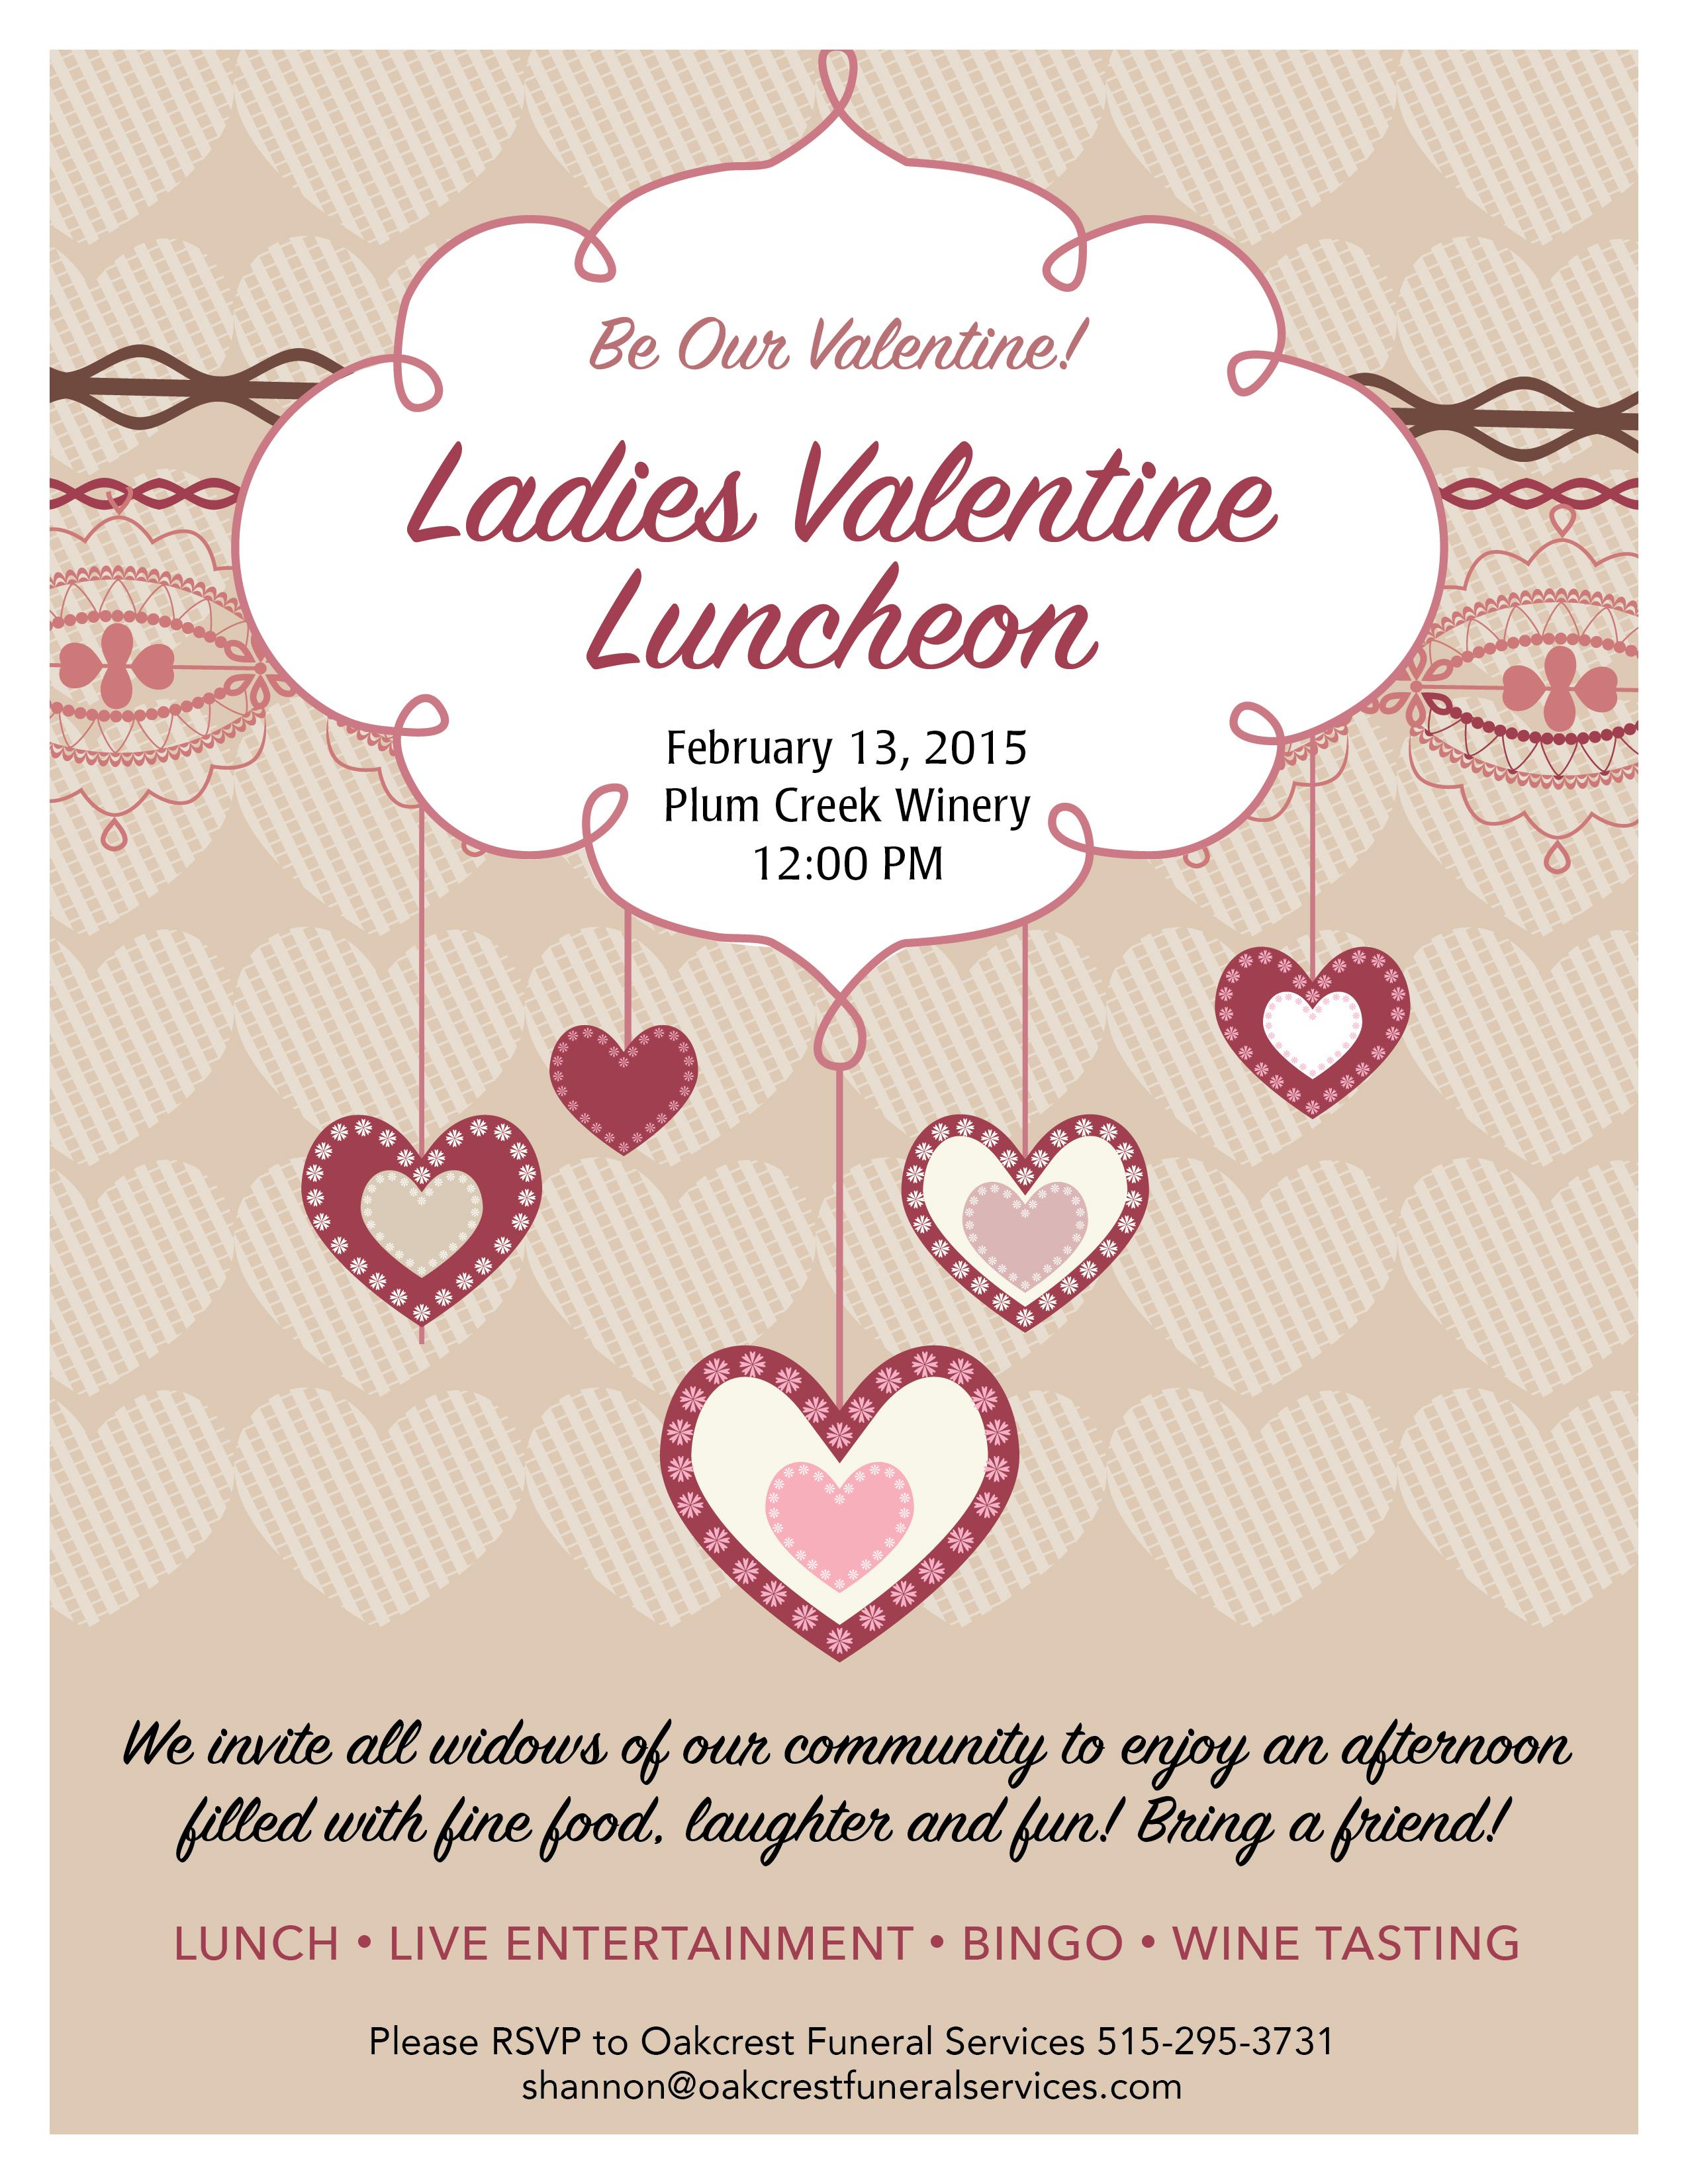 ladies valentine luncheon event for widows oakcrest funeral